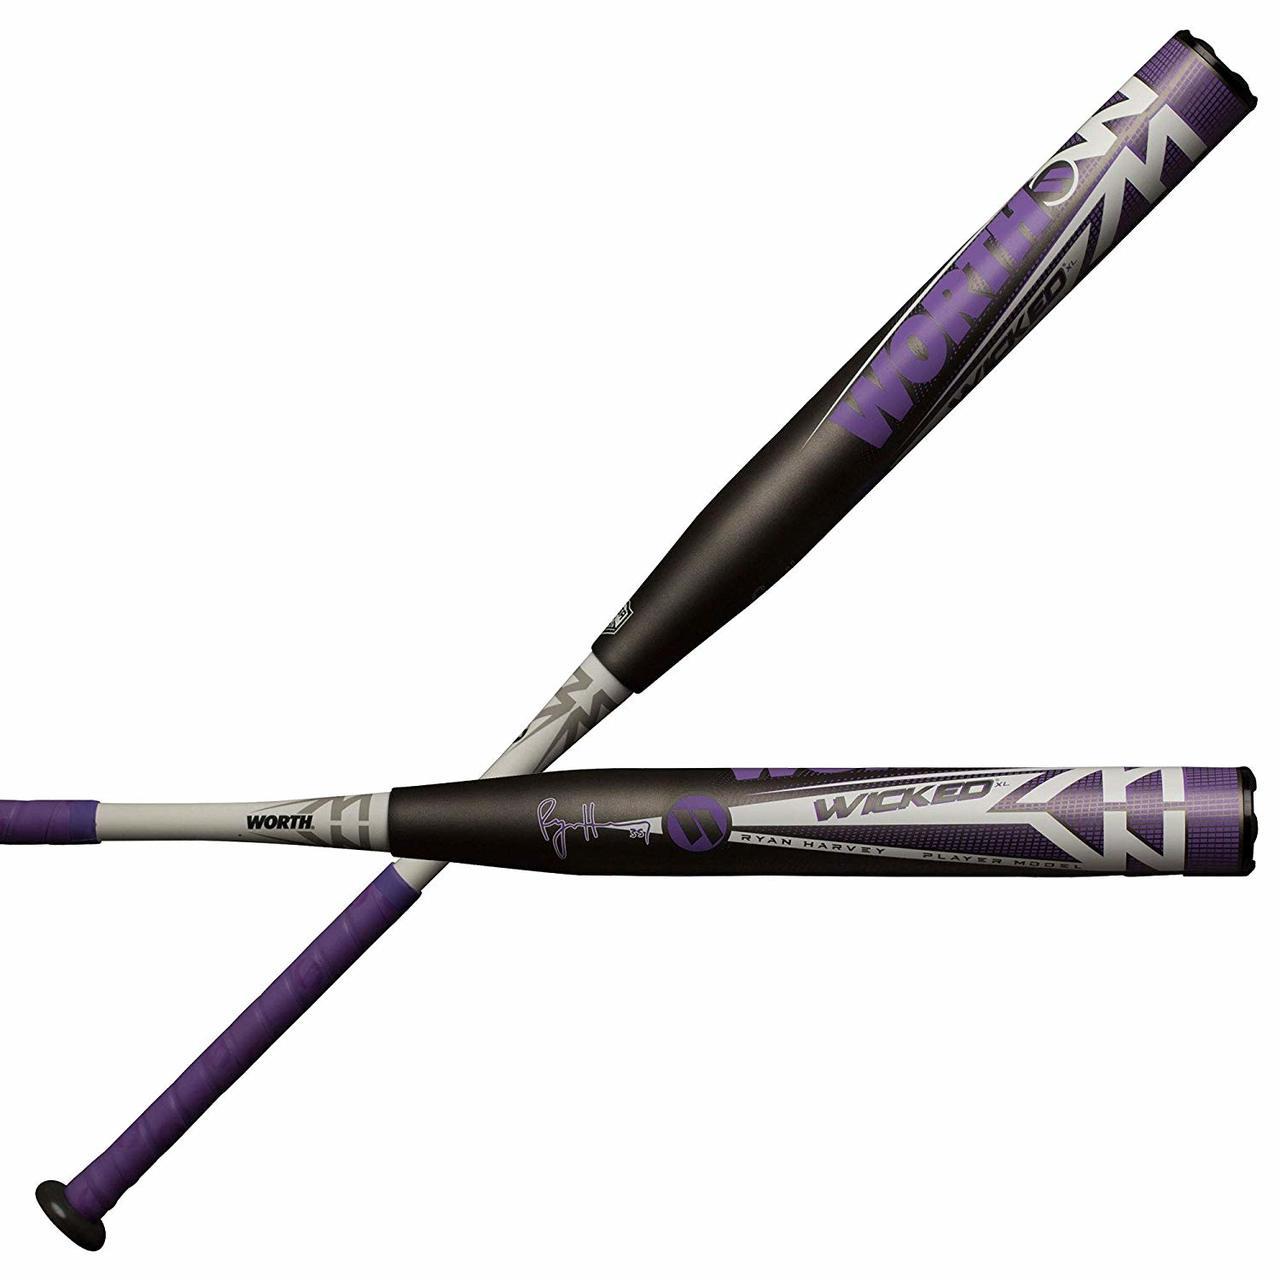 worth-wicked-xl-ryan-harvey-asa-wkrhma-slowpitch-softball-bat-34-inch-27-oz WKRHMA-3-27 Worth 658925041143 2 1/4 Inch Barrel Diameter 3-Piece Composite XL Weighting Approved for